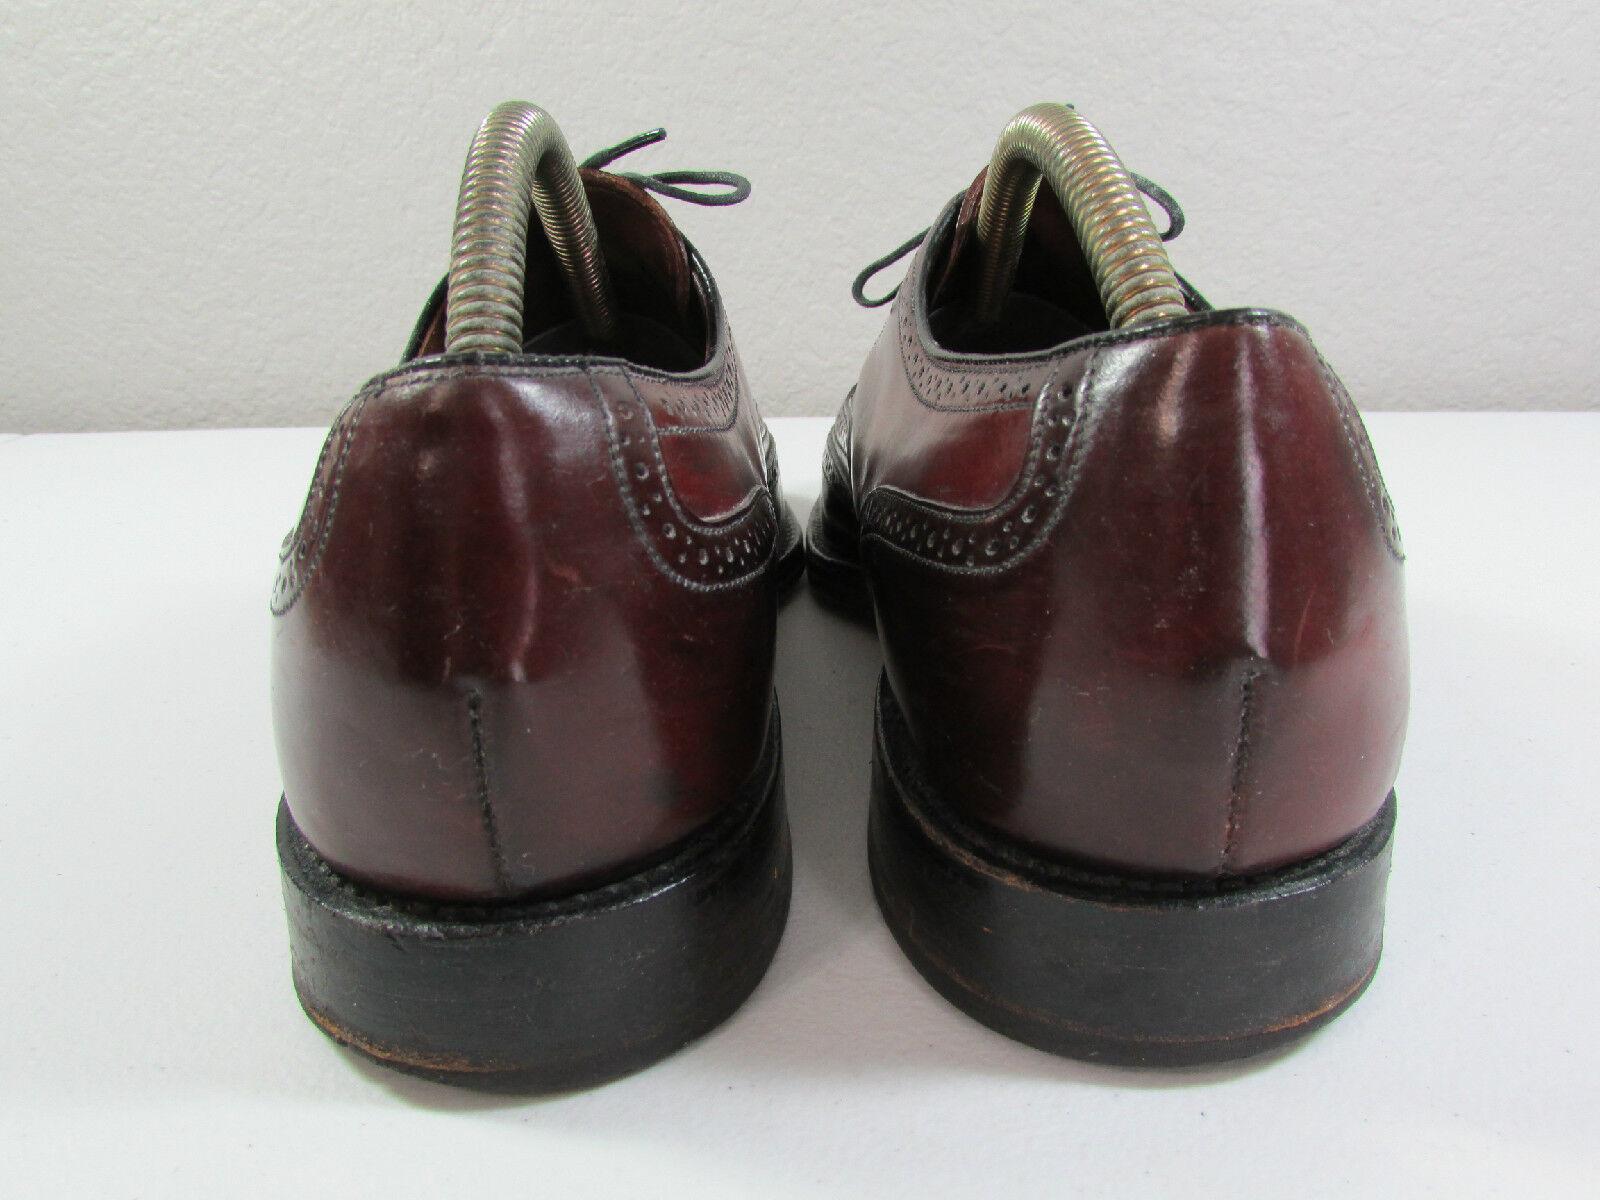 Vintage SHELL CORDOVAN Burgundy Pelle Sole Burgundy CORDOVAN Brogue Oxford WINGTIPS Size 12 15da0e